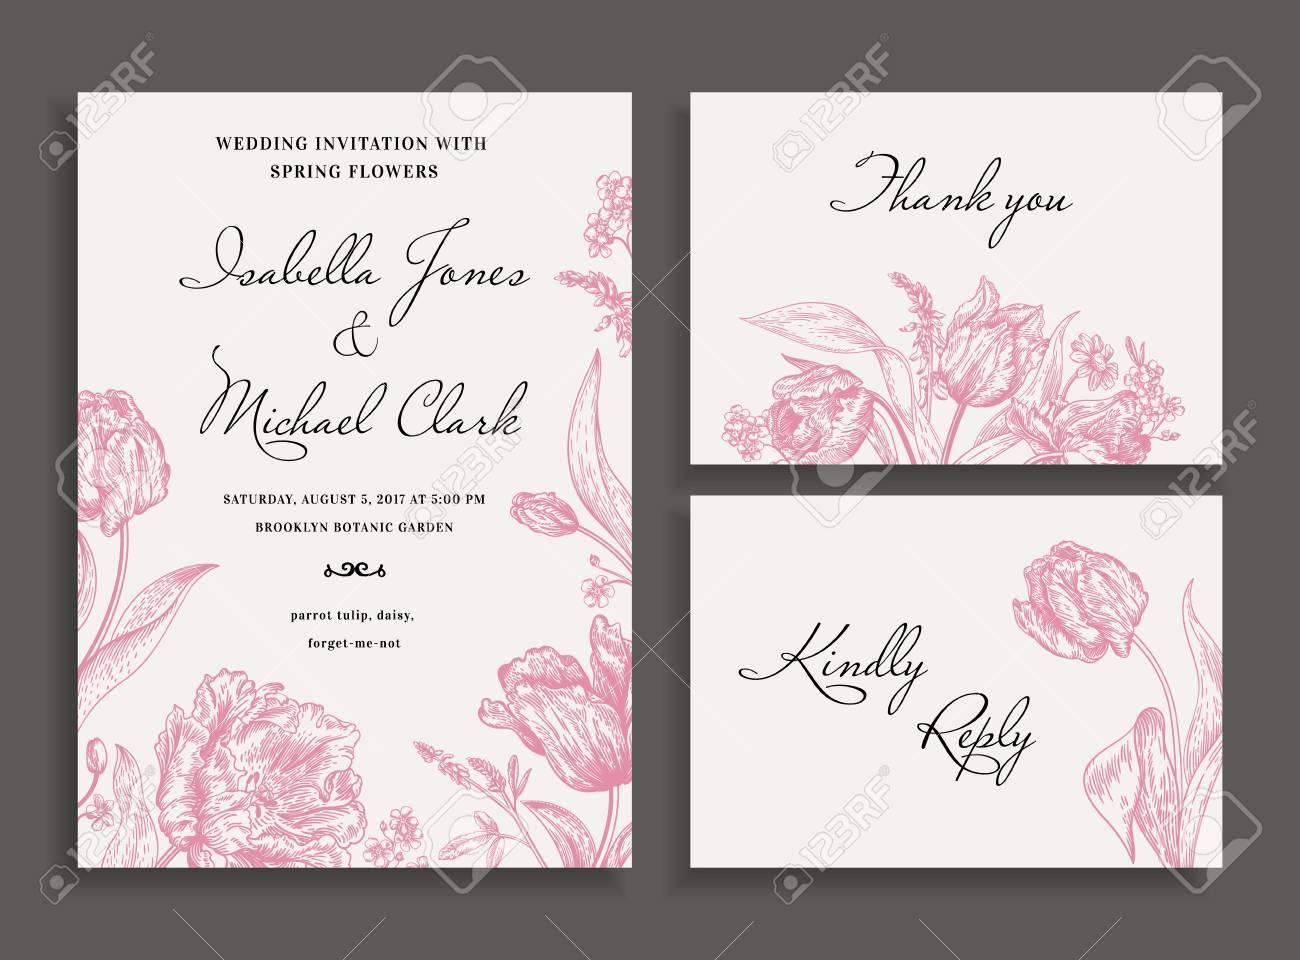 Vintage Wedding Invitation In A Rustic Style. Leather Leaf Fern ...